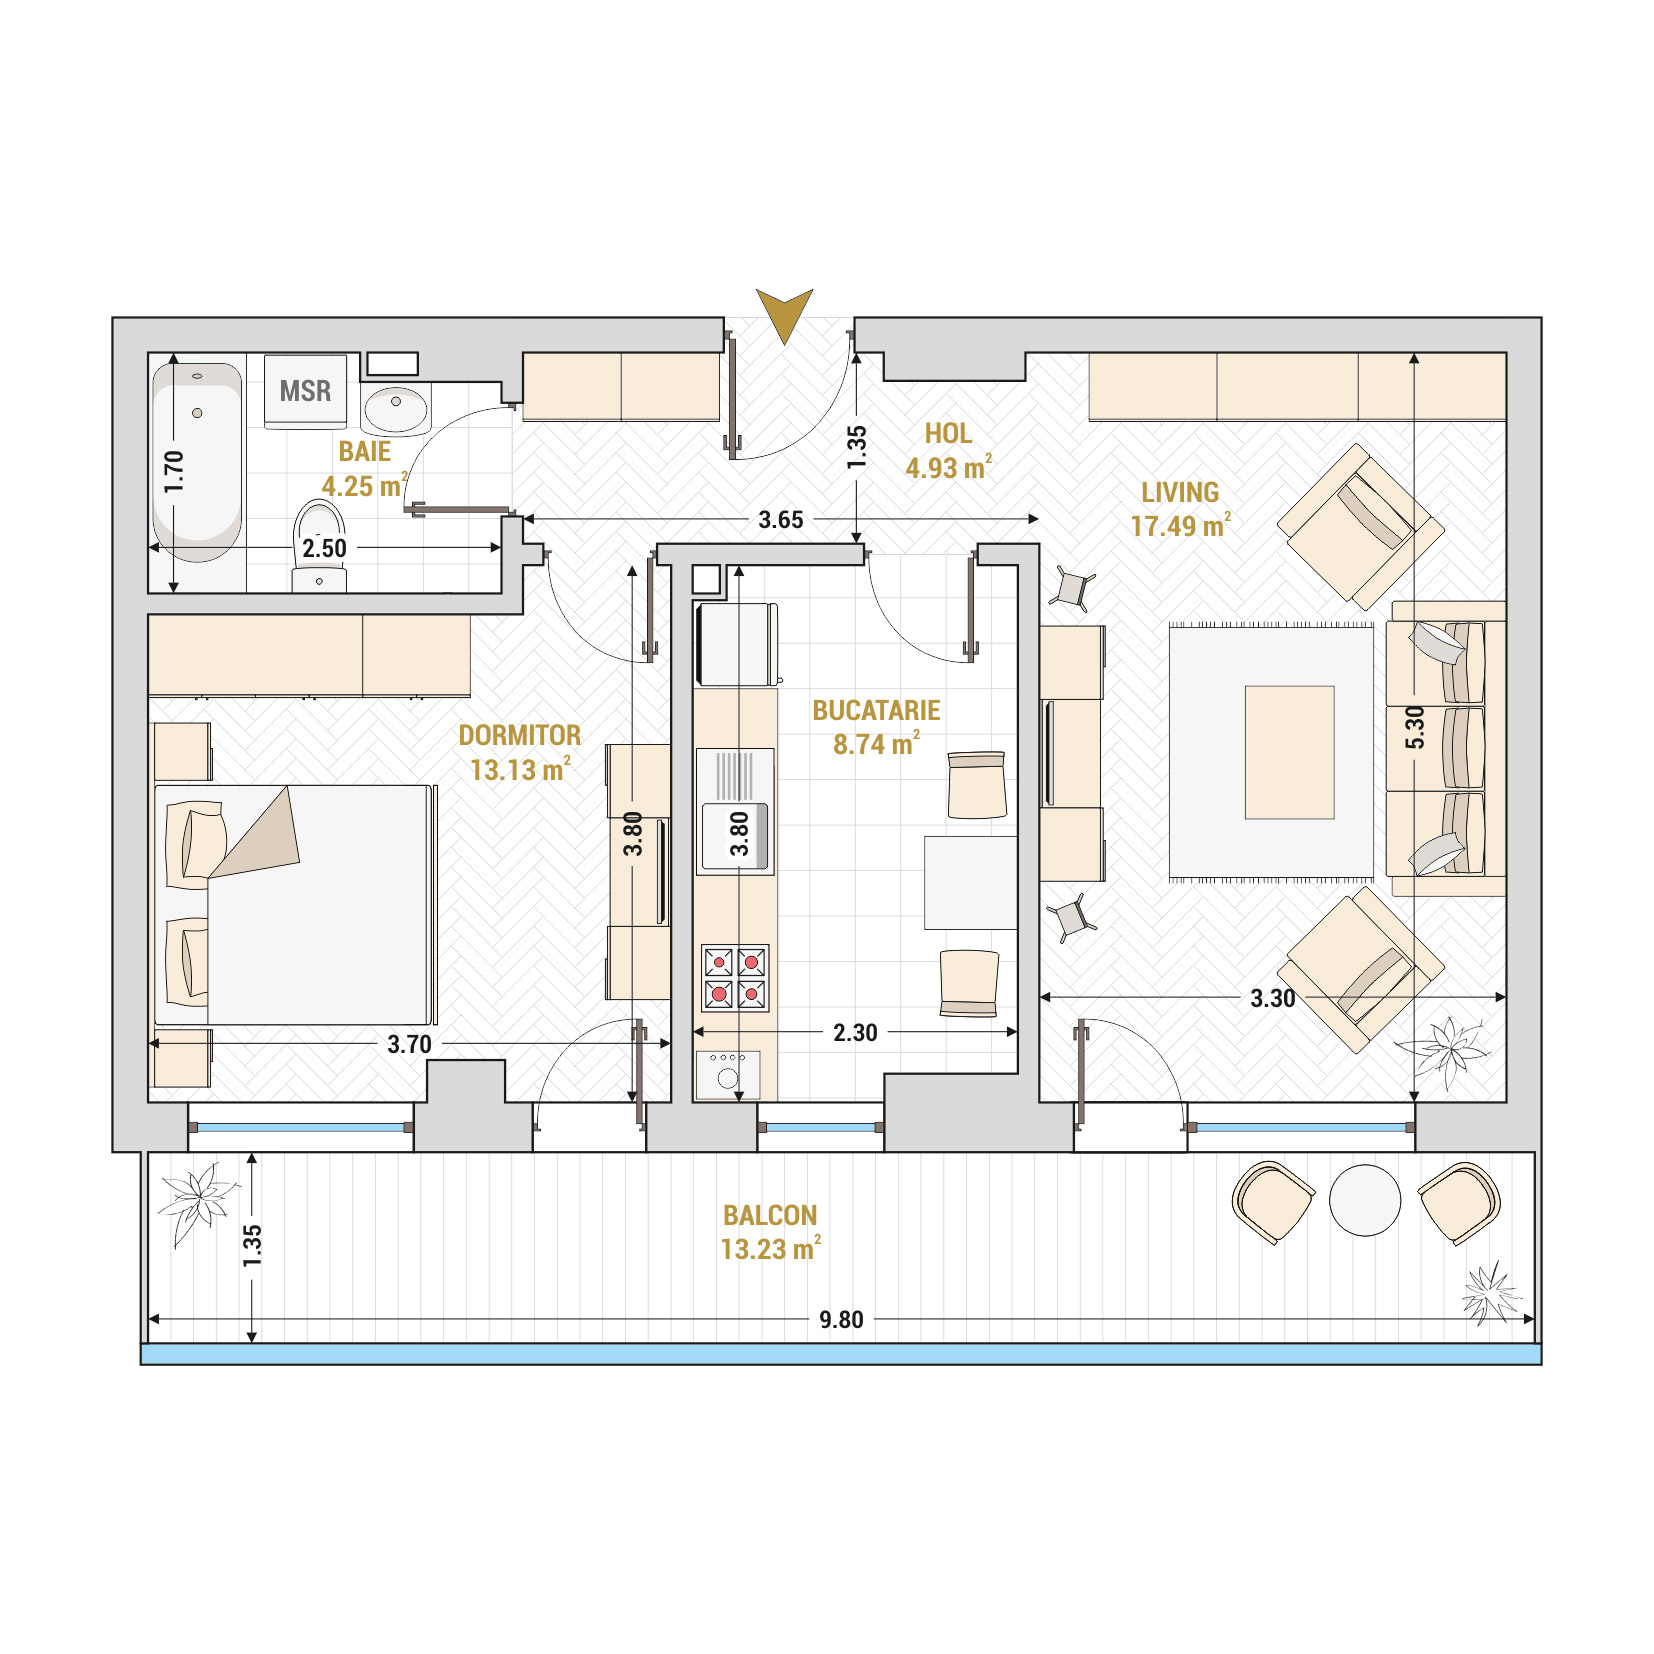 Apartament 2 camere de vanzare Bucuresti - Catedral Residence - Marriott, Piata Unirii, 13 Septembrie, Izvor - Tip 4 - T1